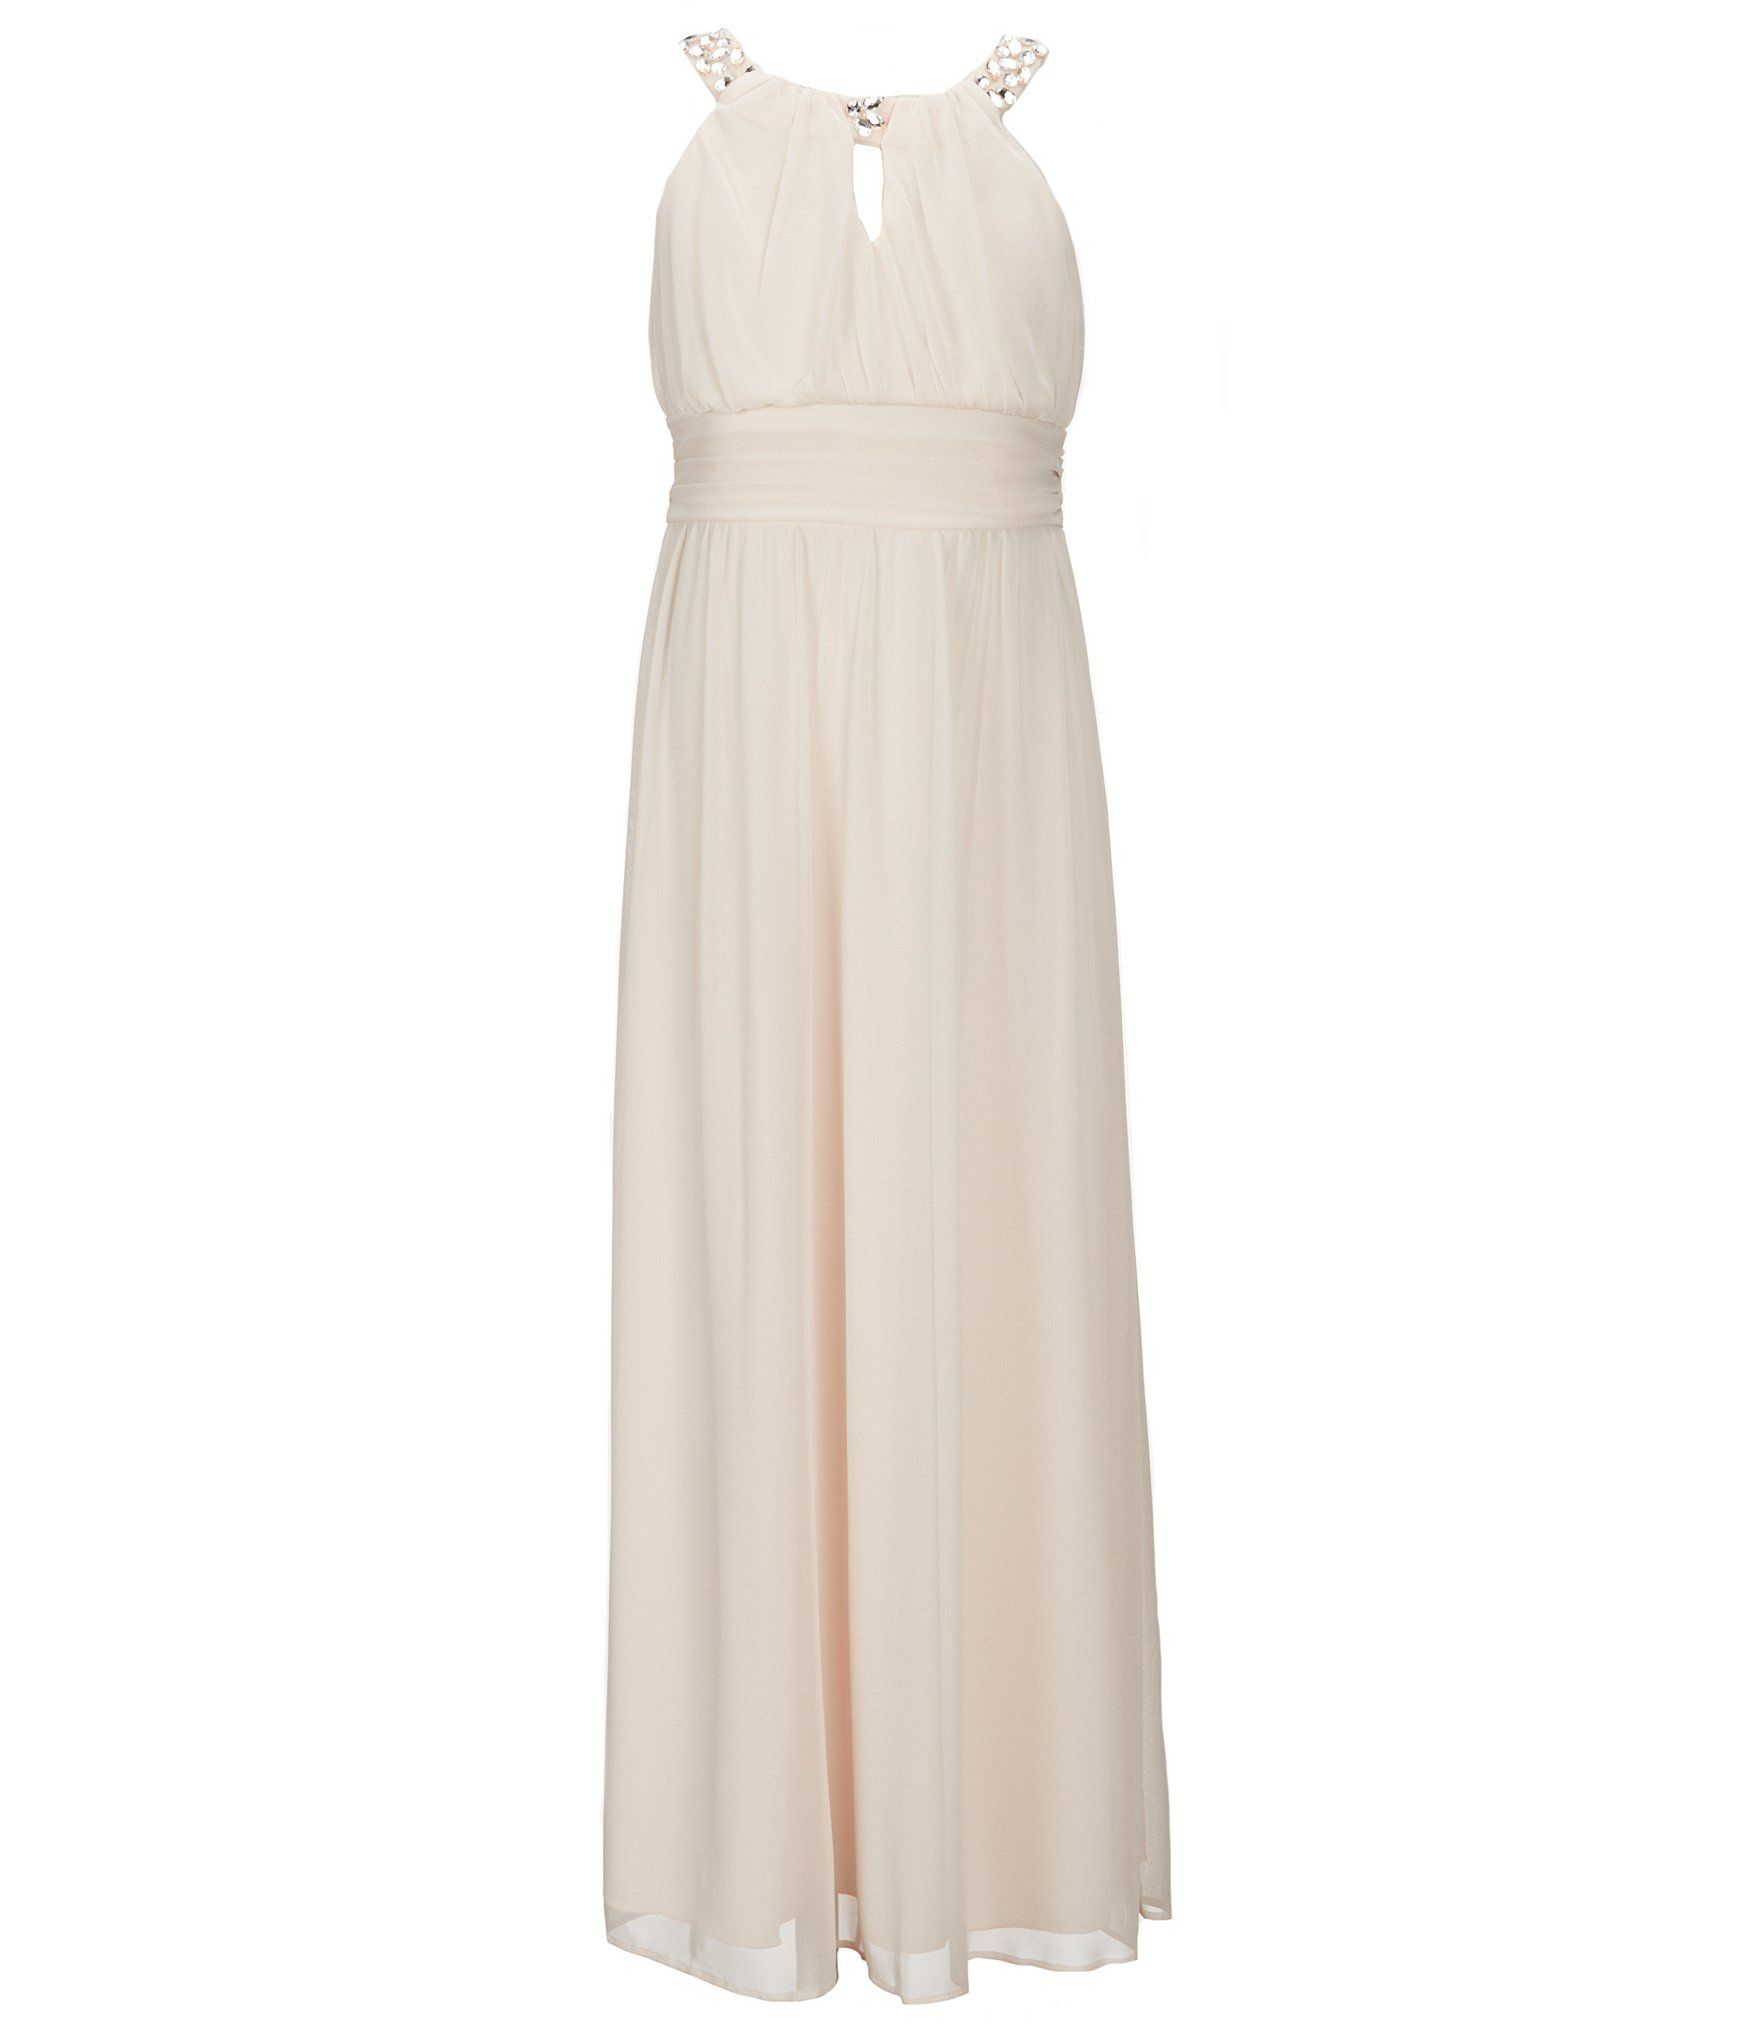 152e30f68f30 Shop for Tween Diva Big Girls 7-16 Chiffon Embellished Long Dress at ...